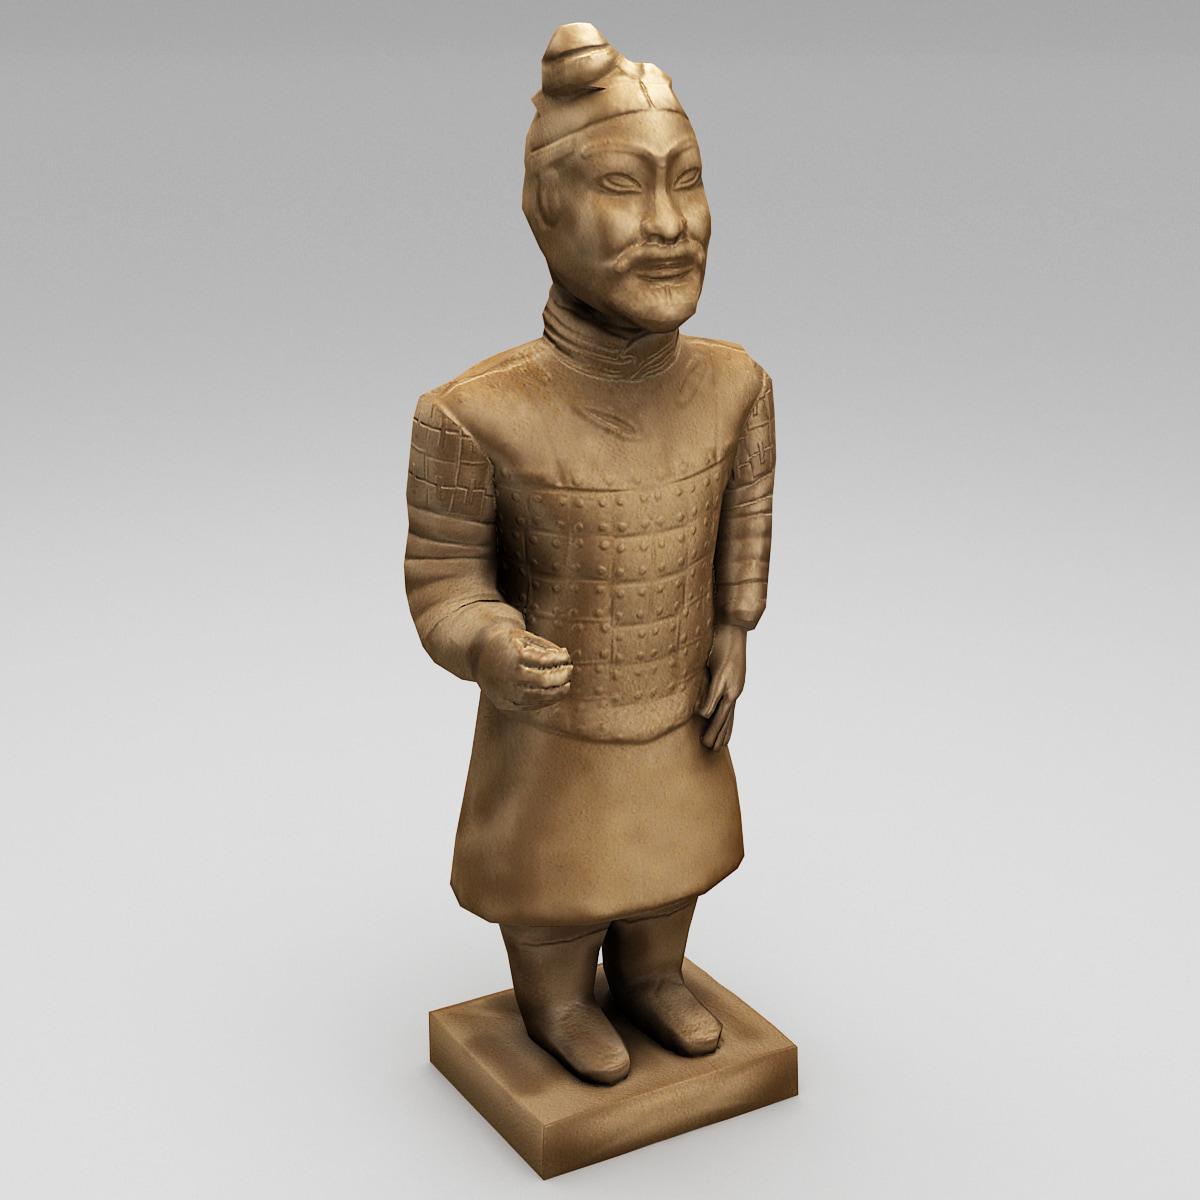 China_Terracotta_Warrior_V3_0001.jpg